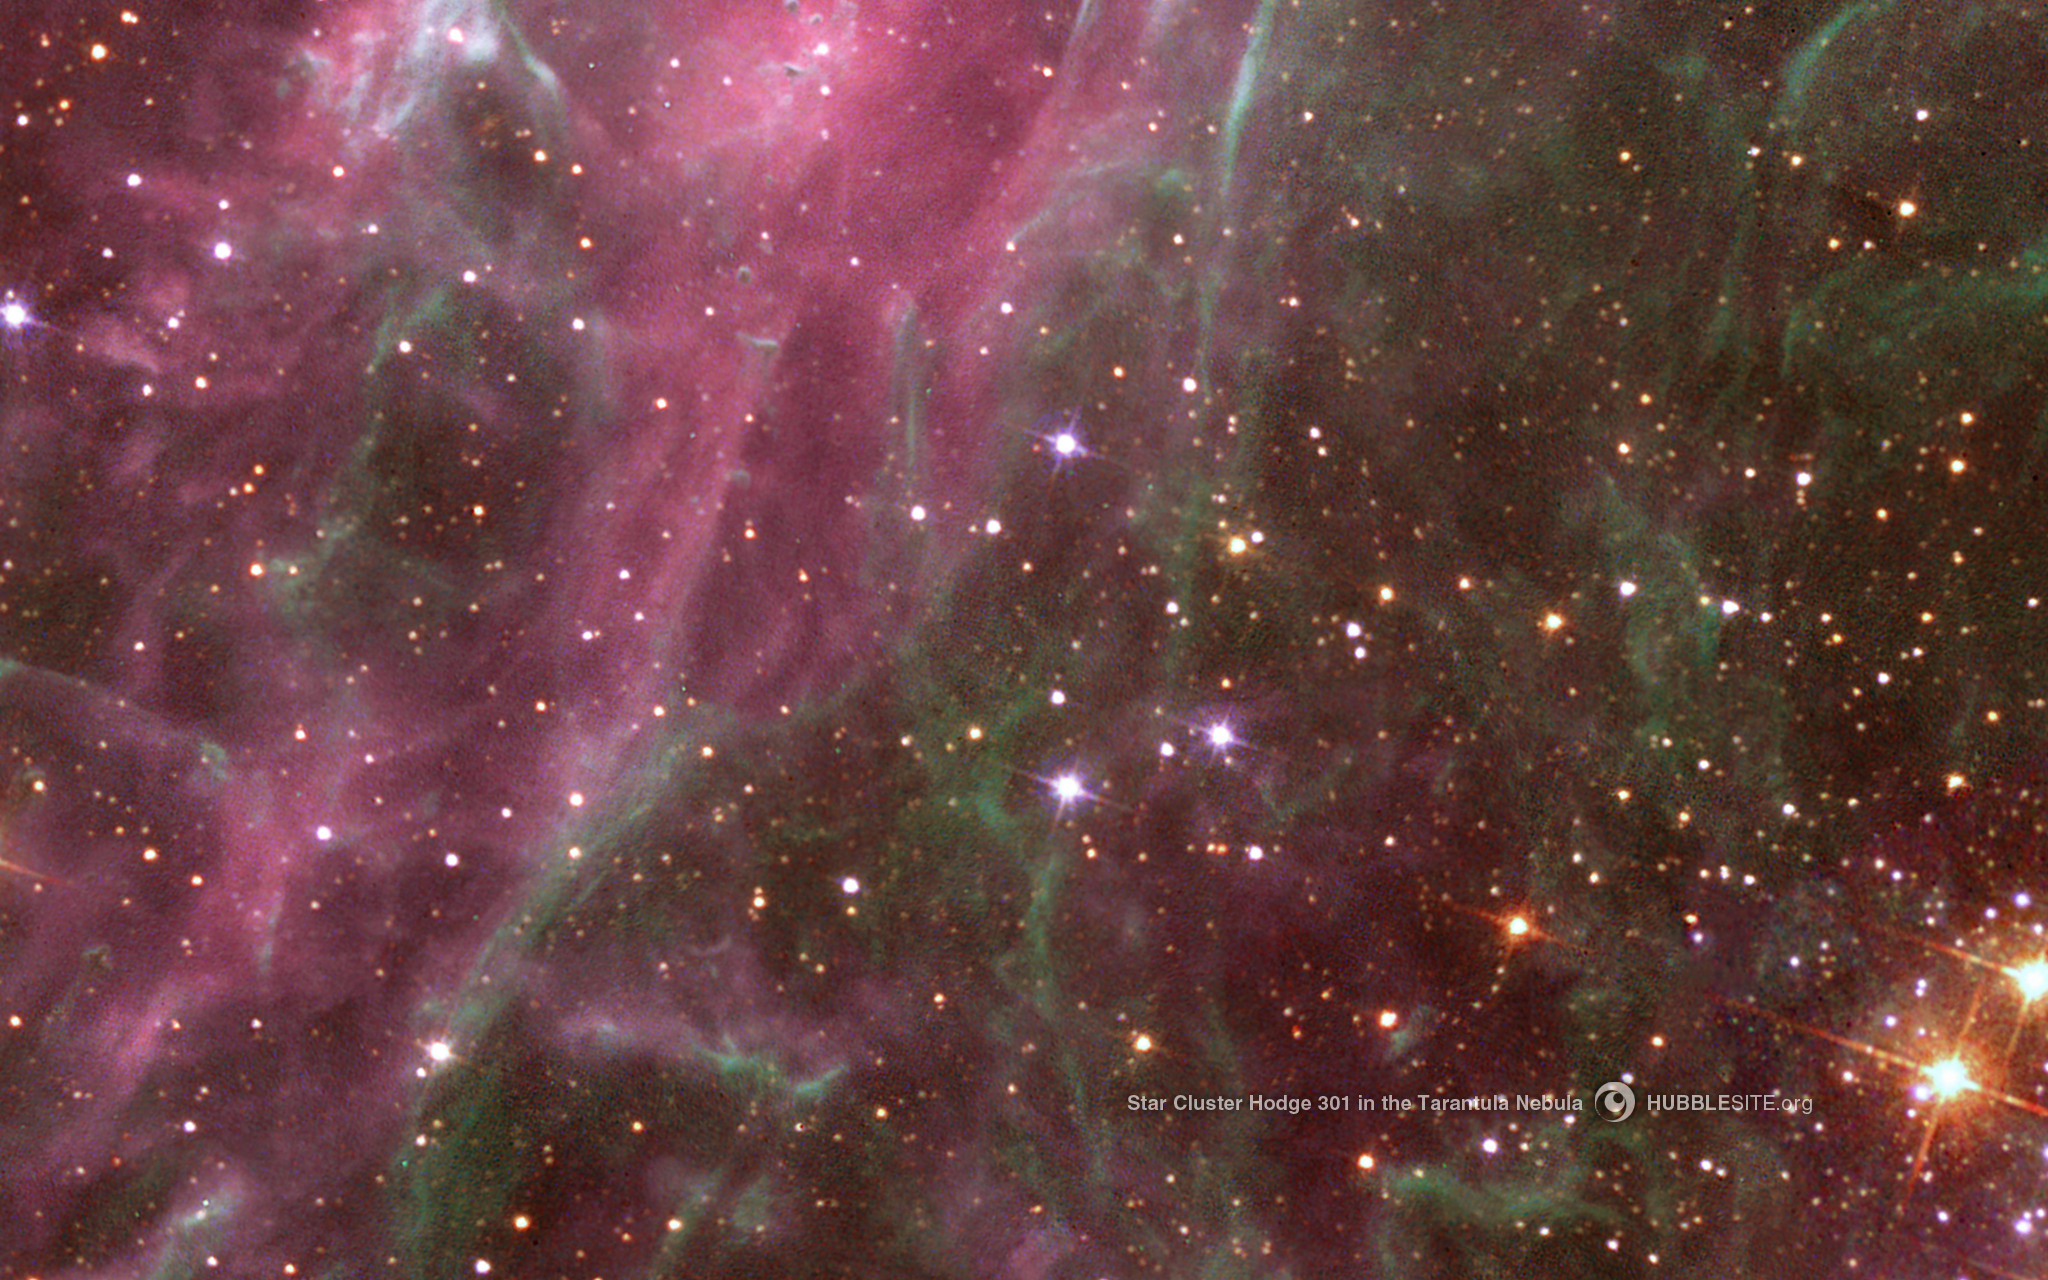 10 – Star Cluster in the Tarantula Nebula